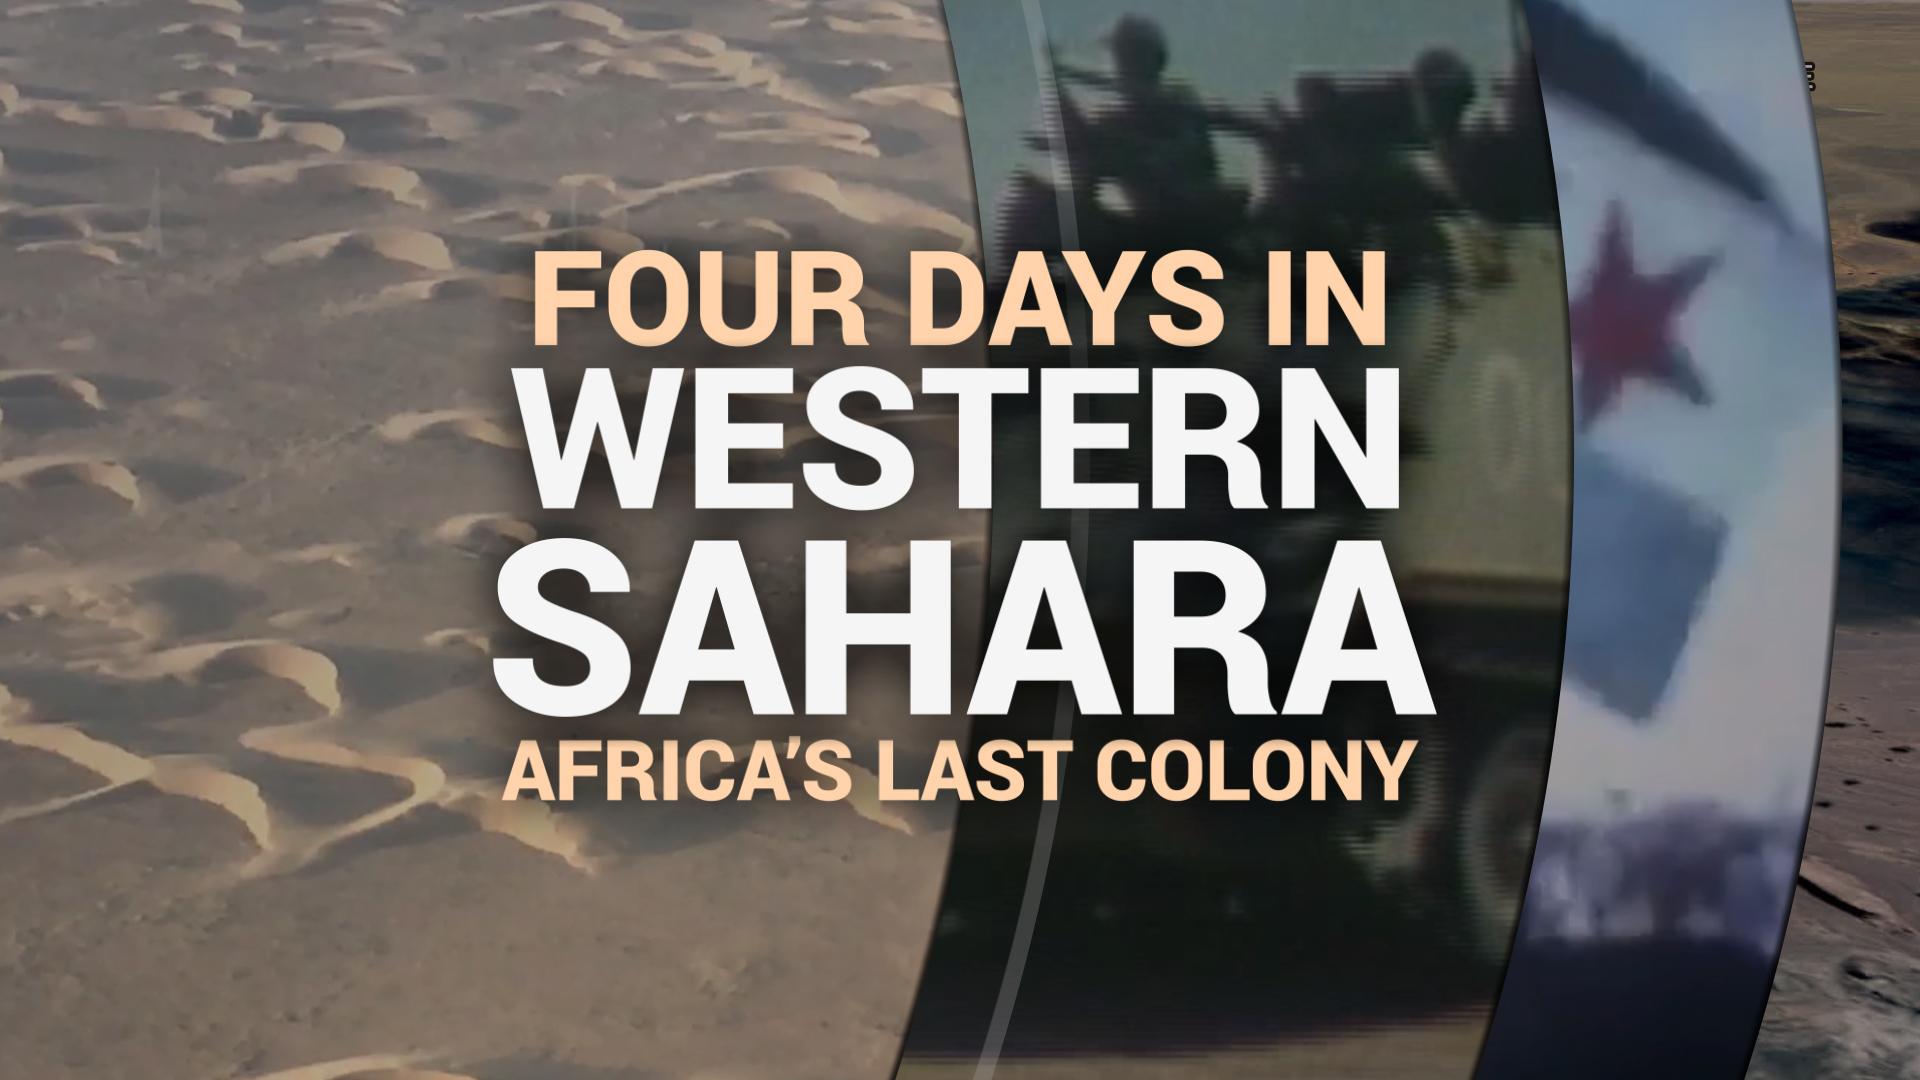 H four days in western sahara0